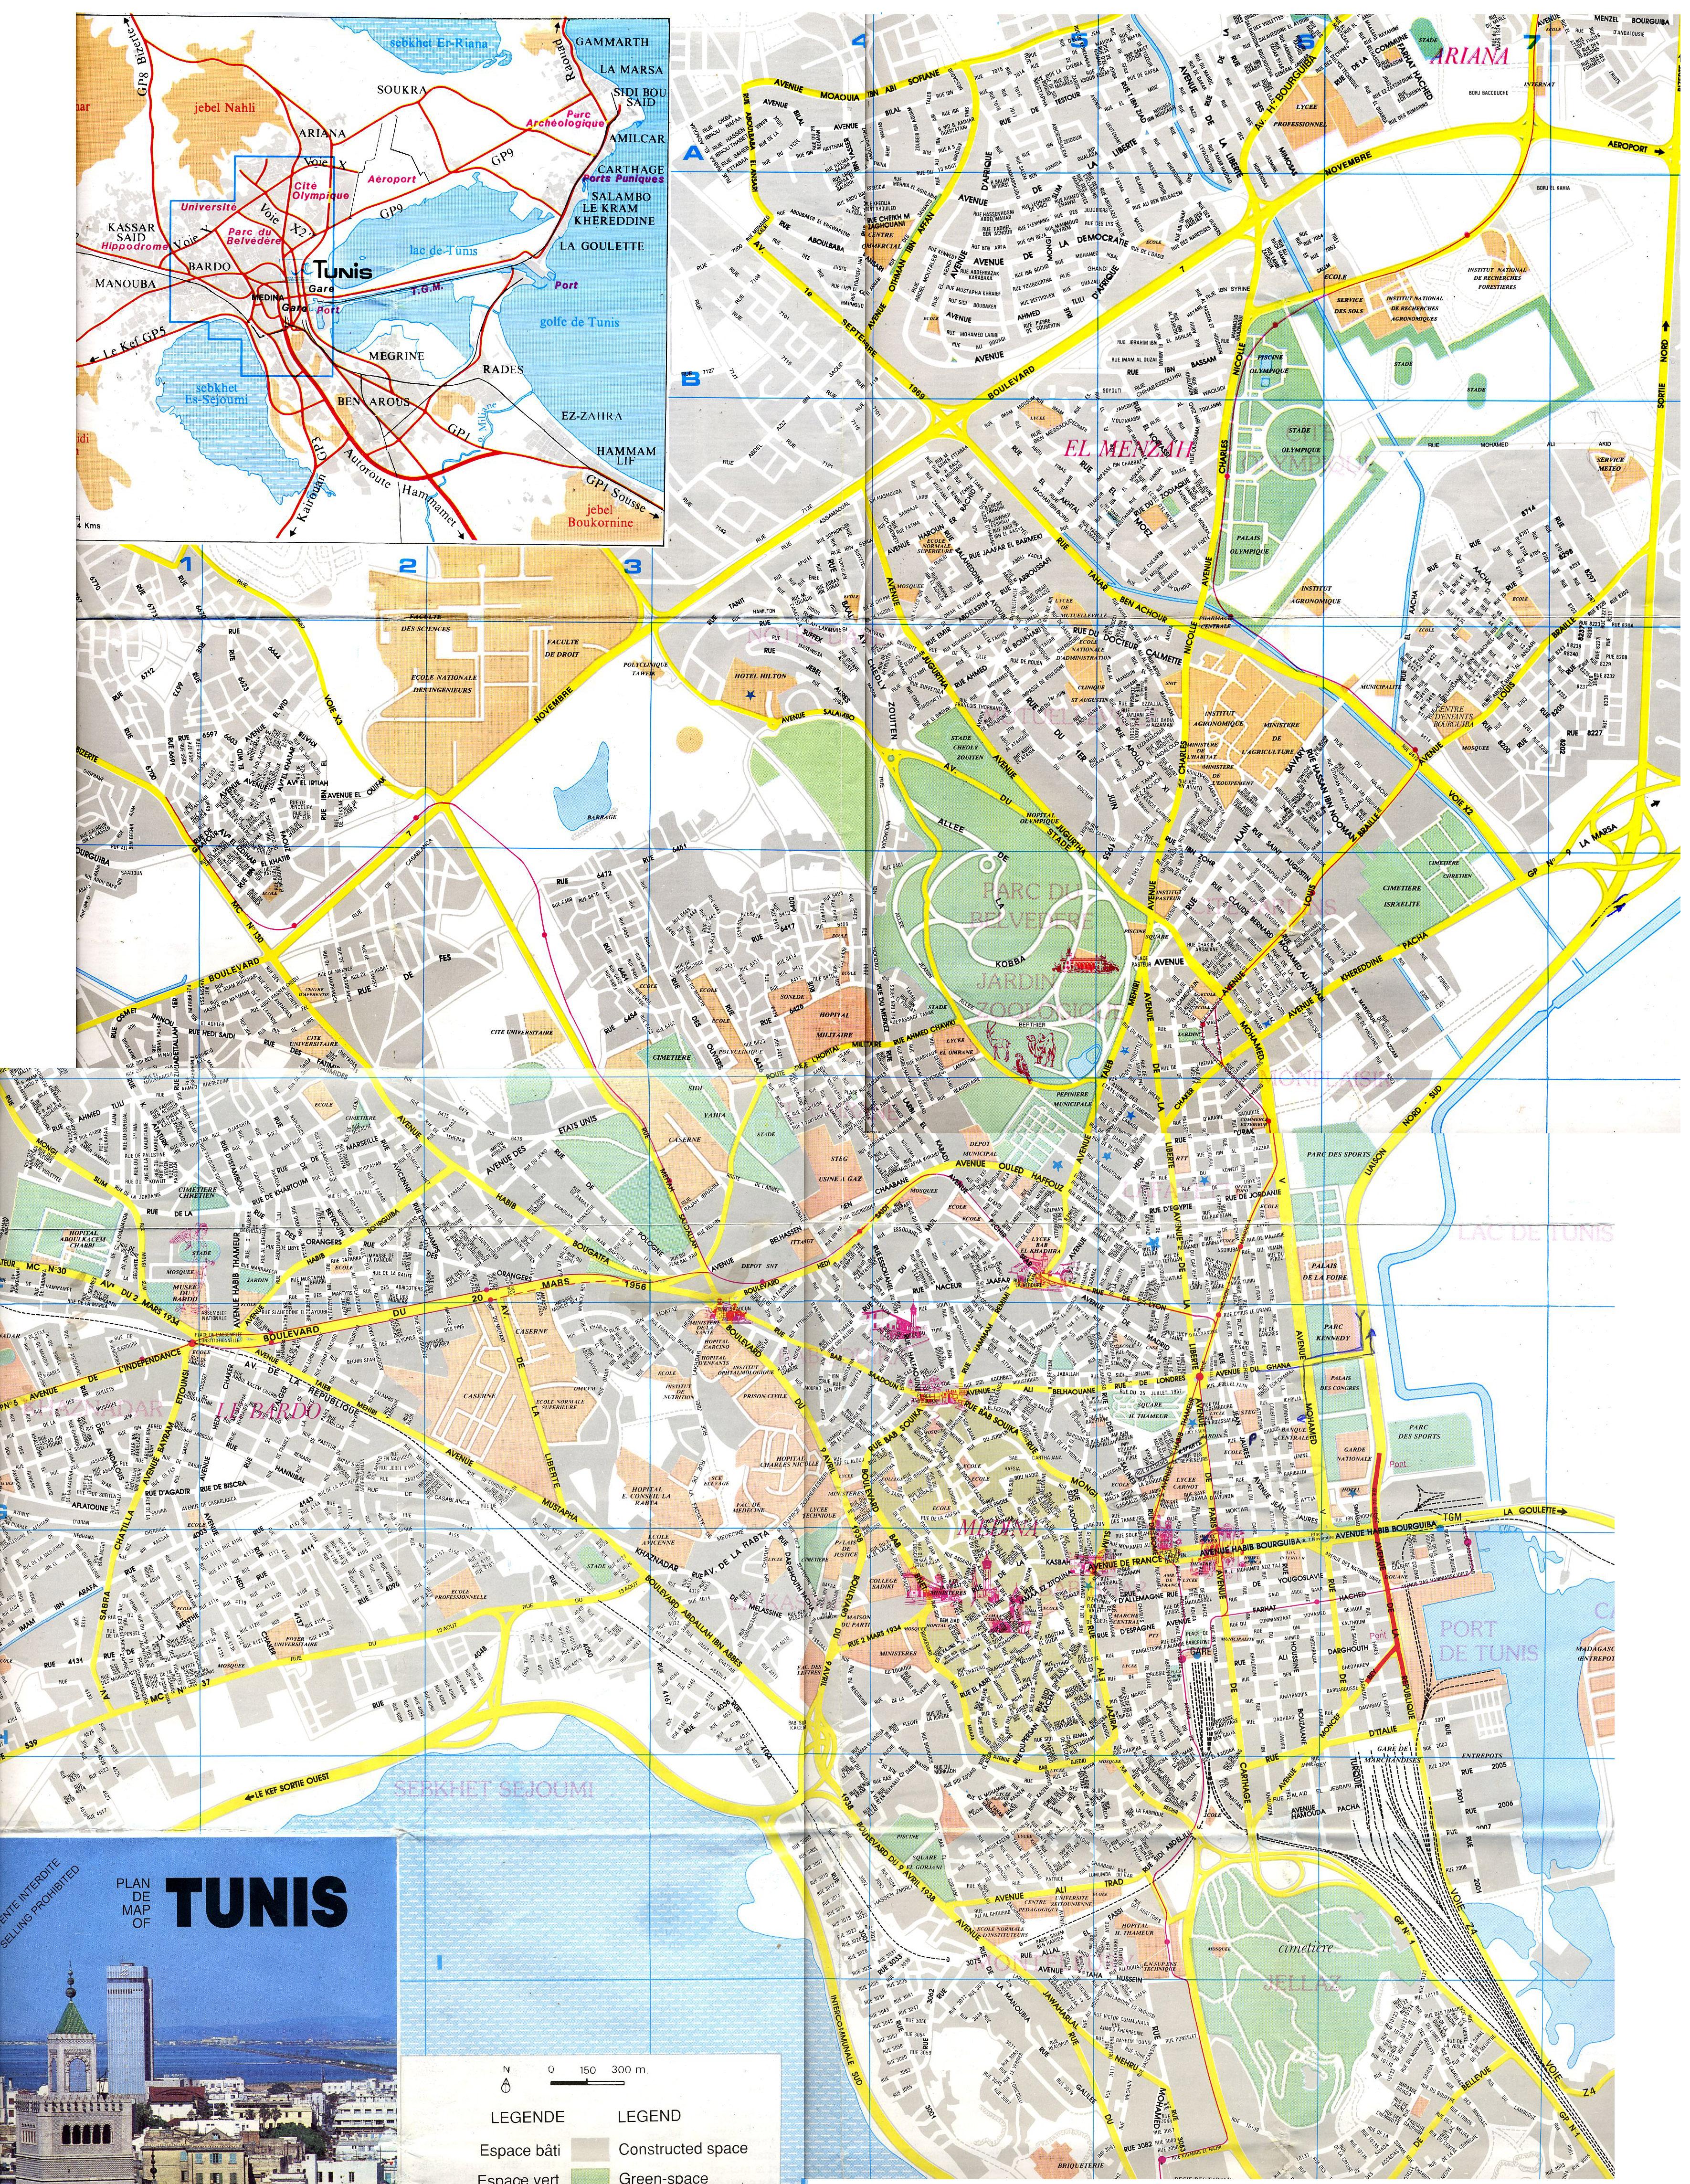 Topographie tunisie